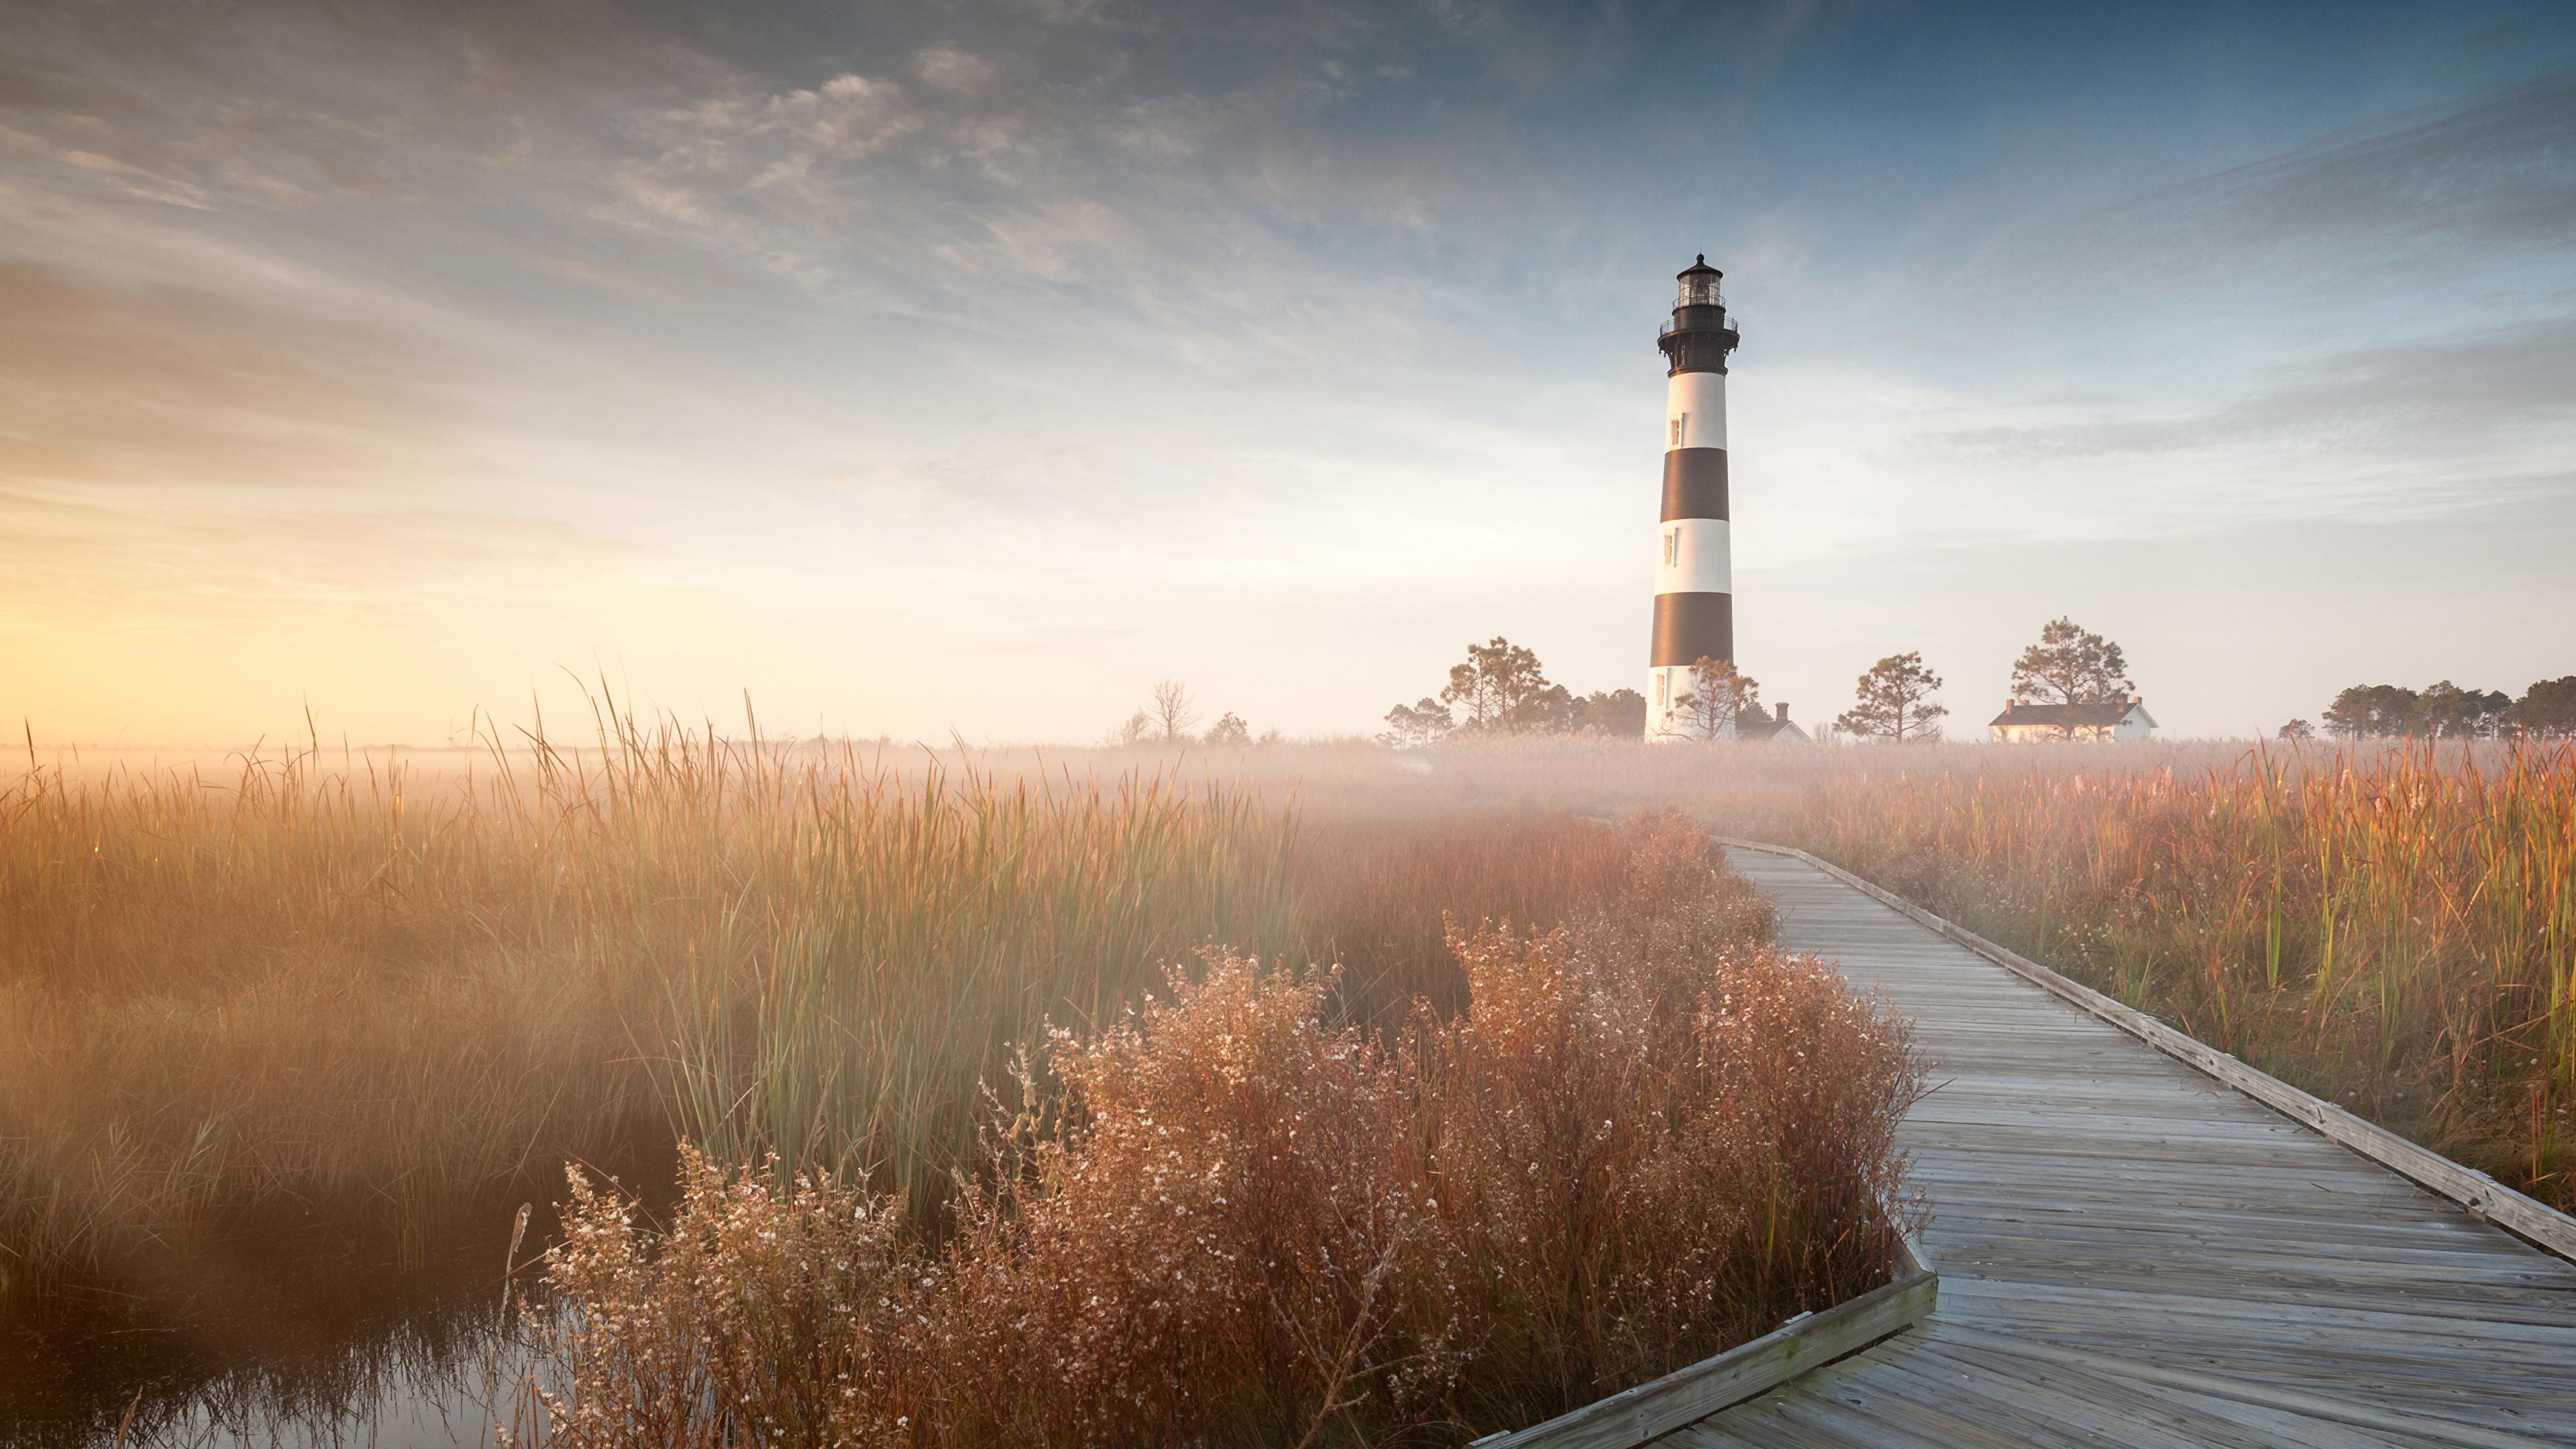 Image USA Bodie Island North Carolina Nature Lighthouses 3840x2160 3840x2160